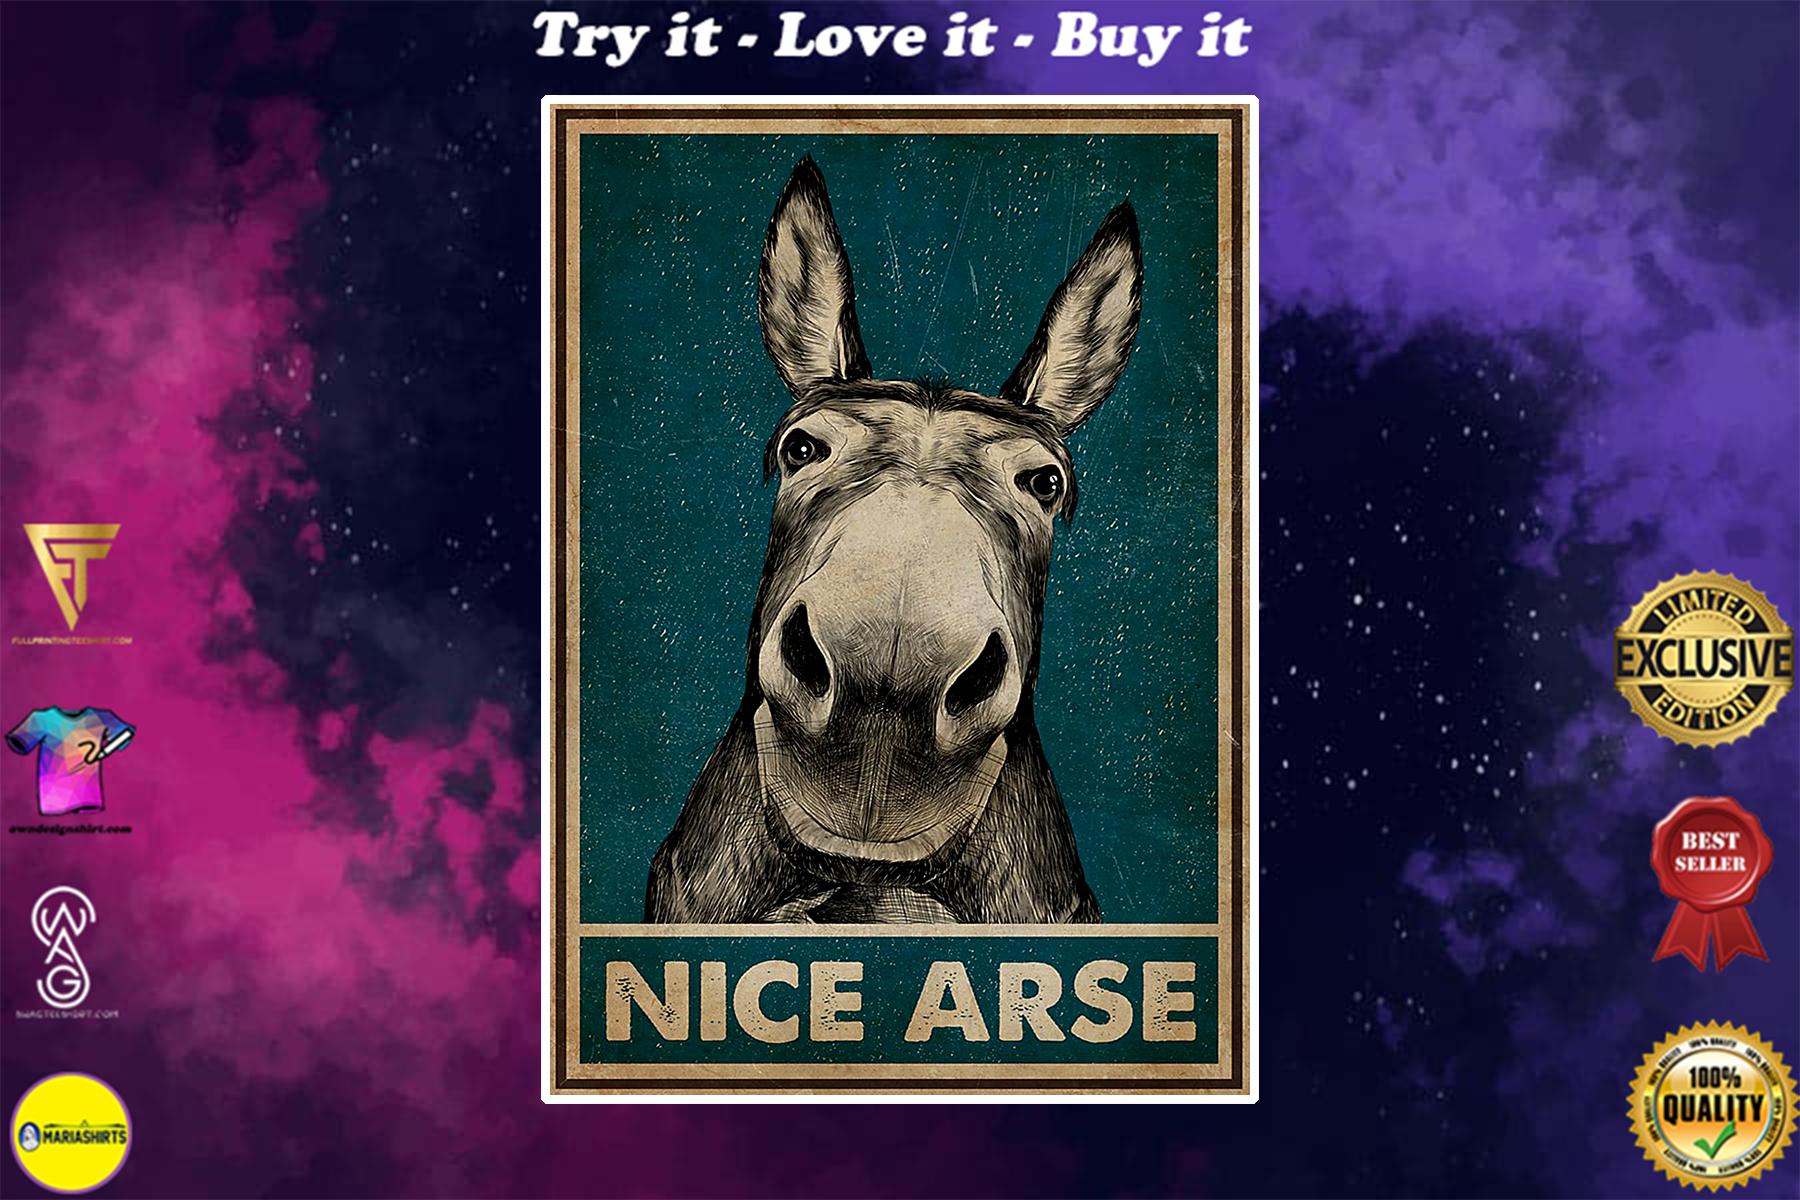 vintage donkey nice arse poster